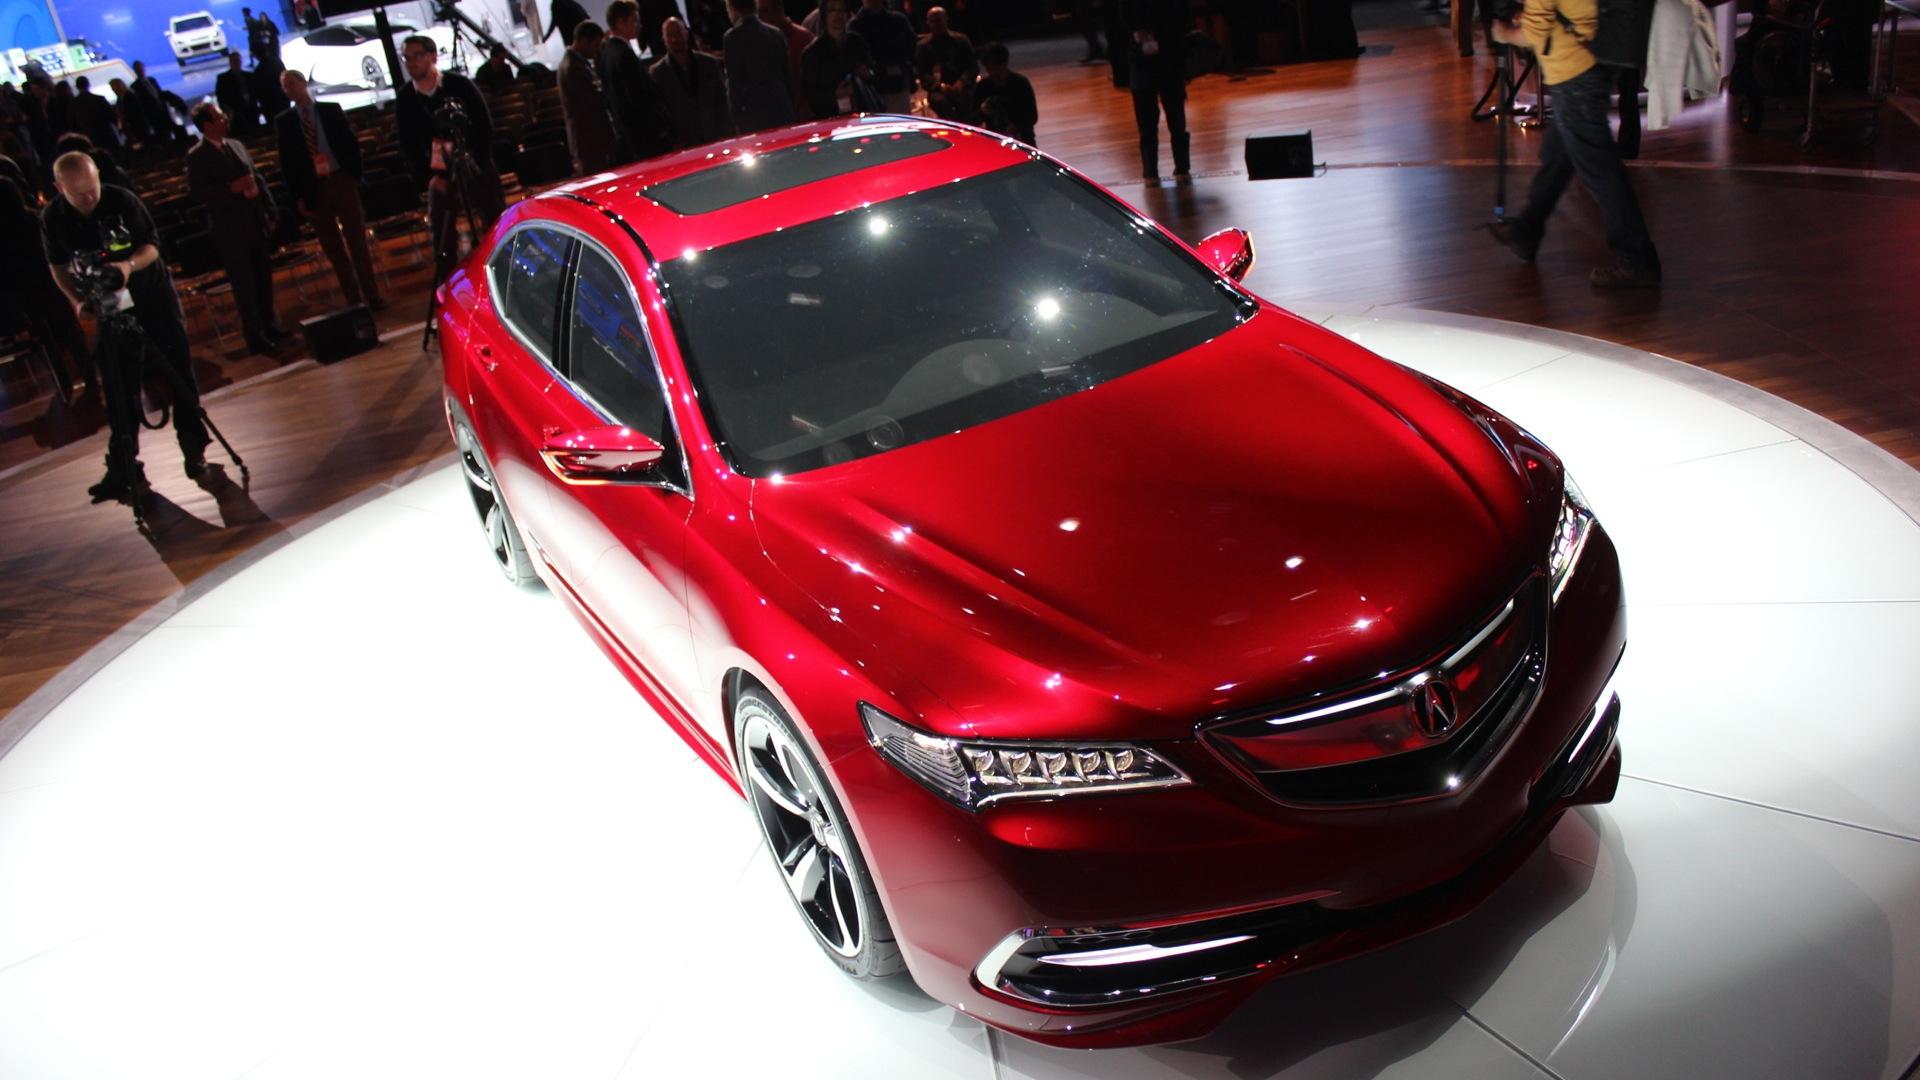 2015 Acura TLX (prototype)  -  2014 Detroit Auto Show live photos